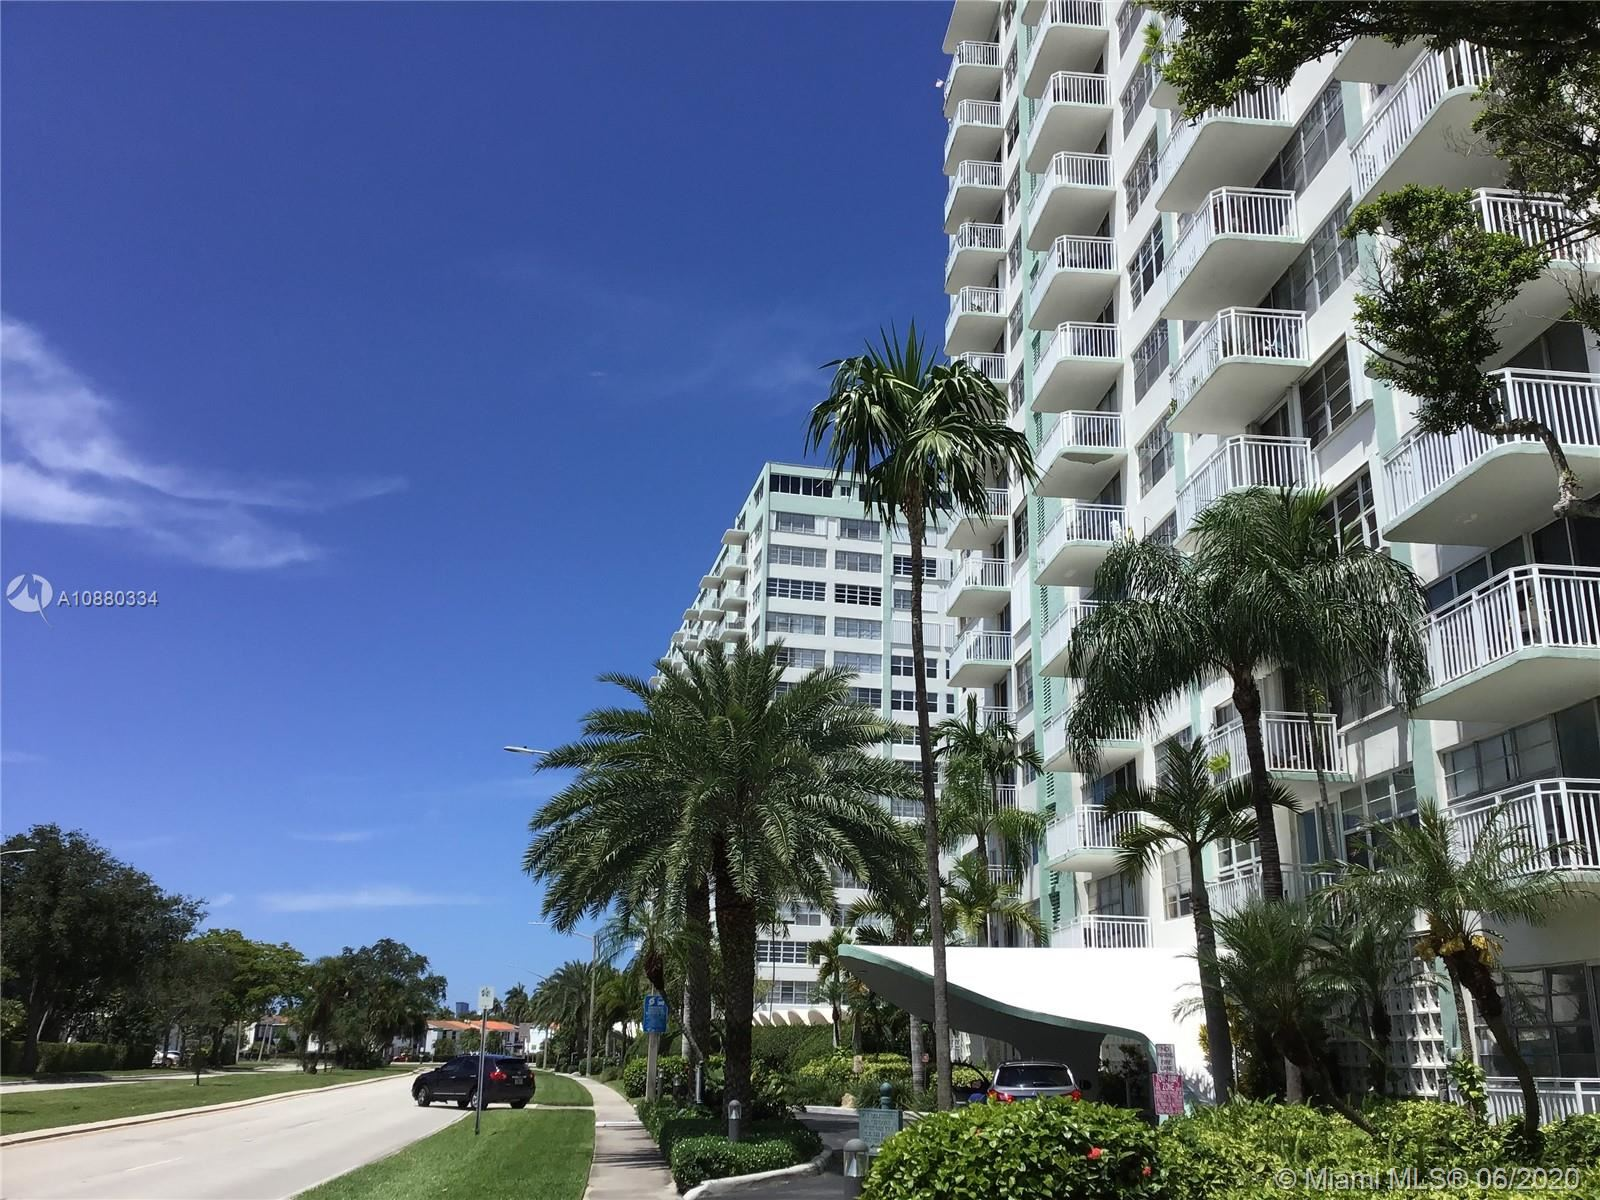 2150 Sans Souci Blvd #A1110, North Miami, FL 33181 - #: A10880334